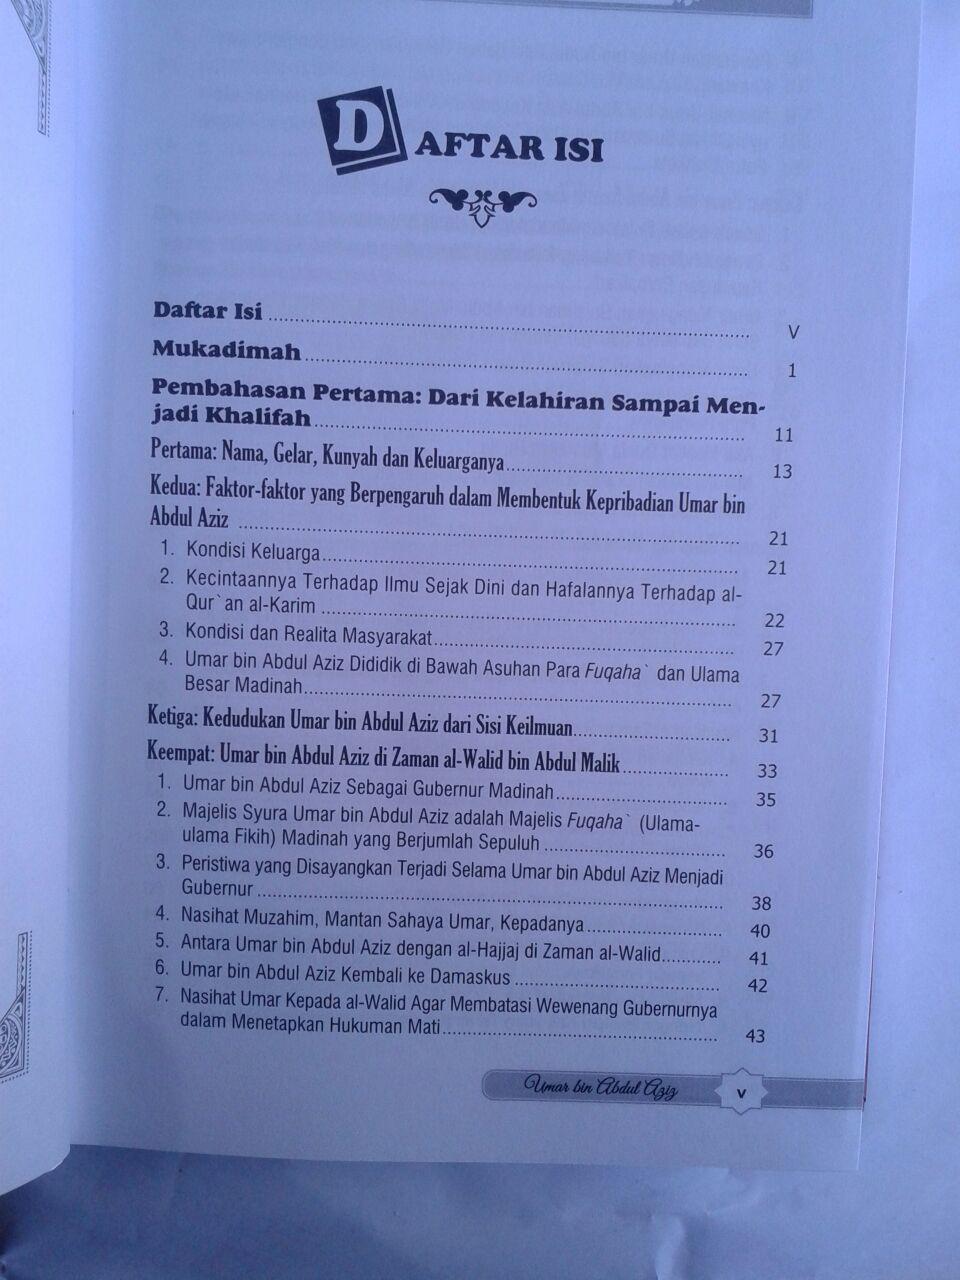 Buku Perjalanan Hidup Khalifah Yang Agung Umar Bin Abdul Aziz Ulama Dan Pemimpin Yang Adil isi 2